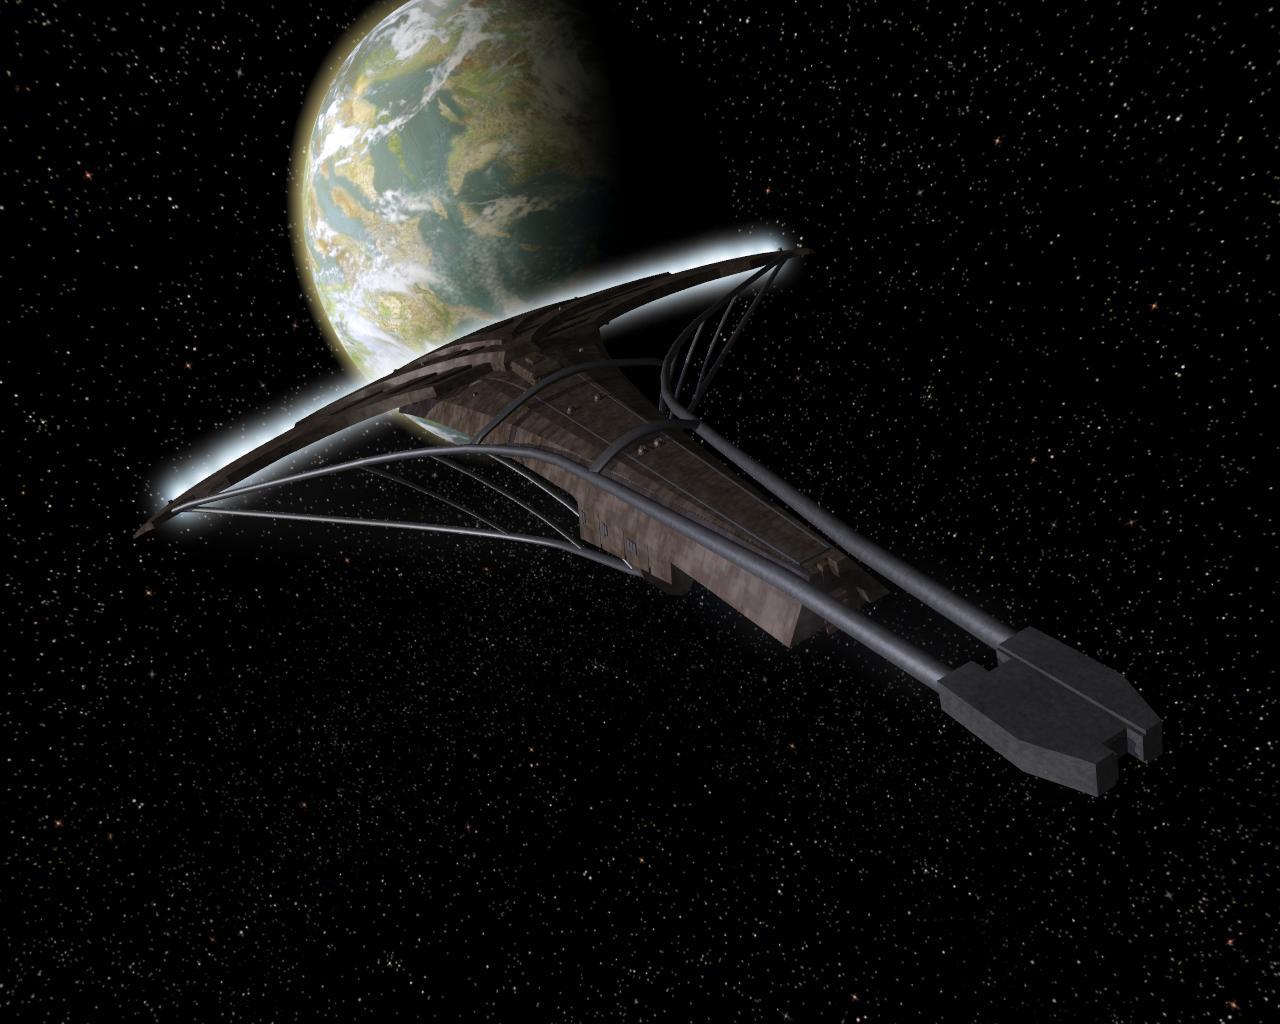 seed ship wip image stargate mod war begins for nexus